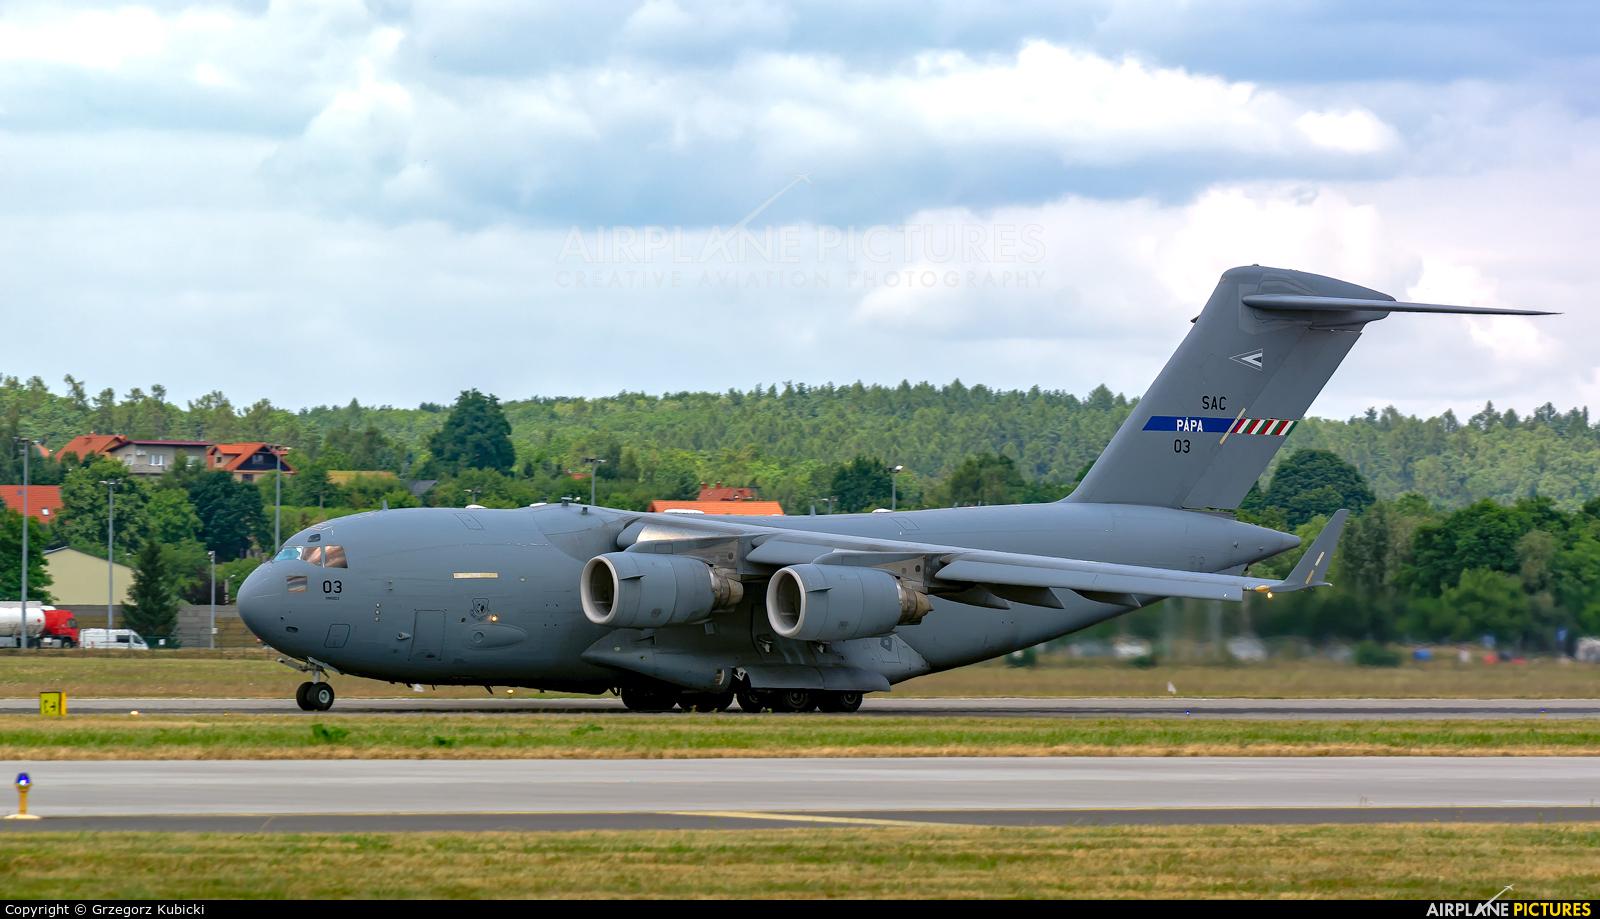 NATO SAC 03 aircraft at Kraków - John Paul II Intl